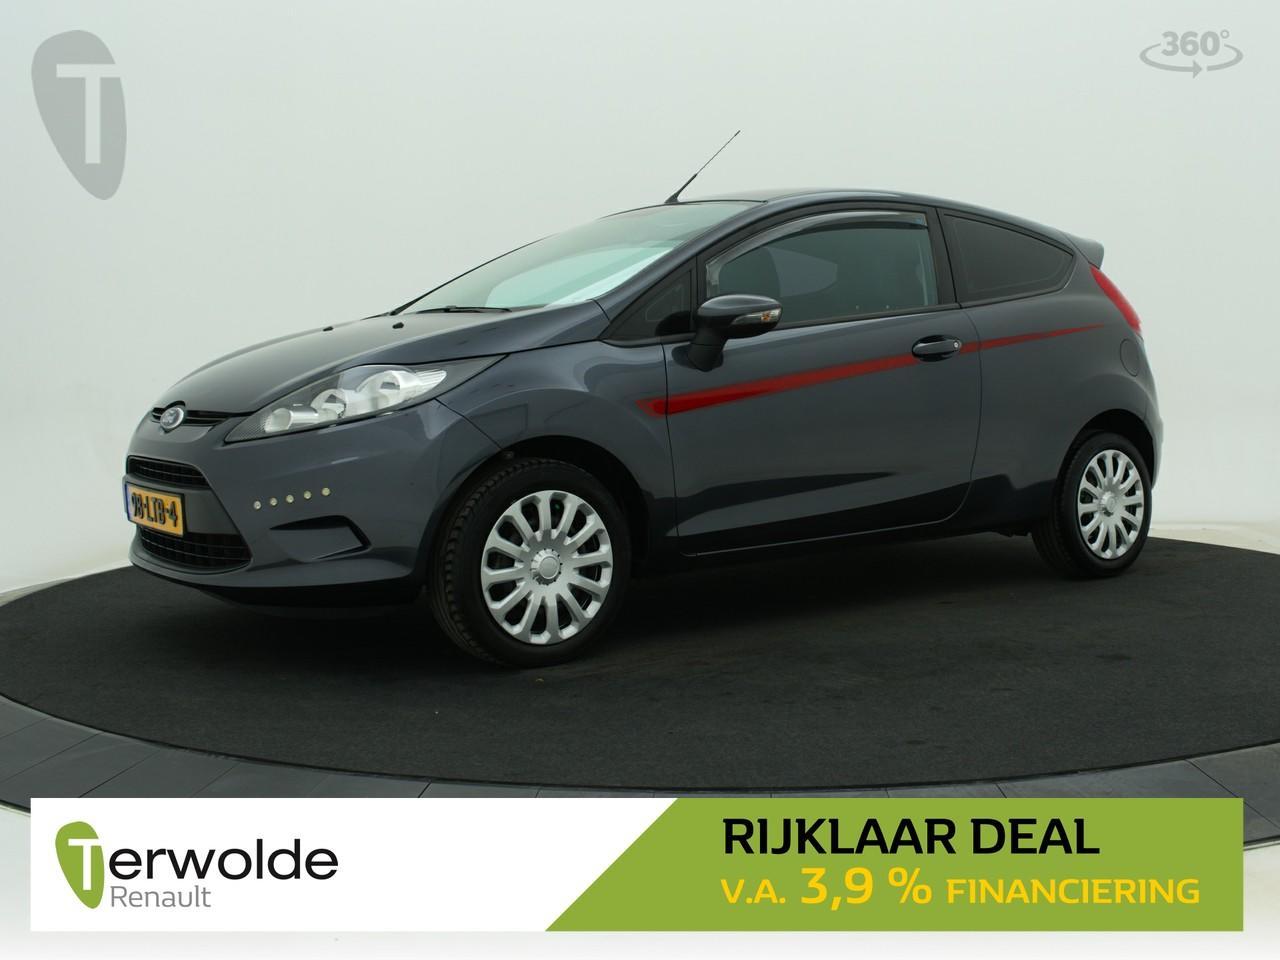 Ford Fiesta 1.25 limited 3drs. airco i centrale vergrendeling i audio * rijklaar *